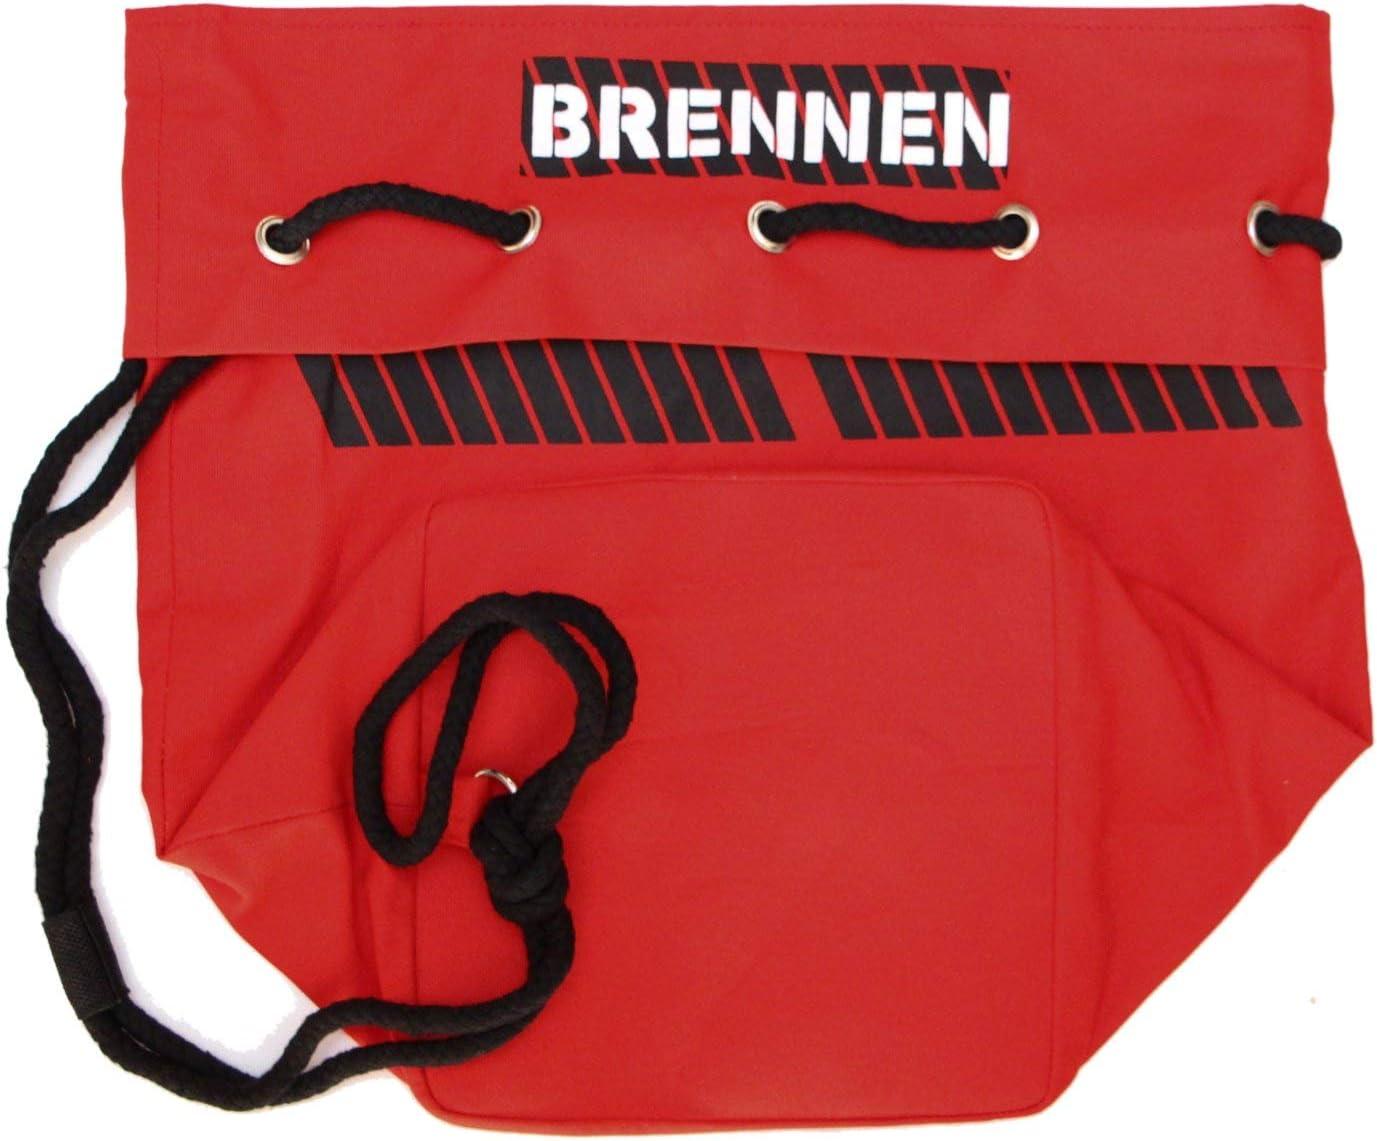 JASON BOURNE Red Burn Bank BAG by Magnoli Clothiers